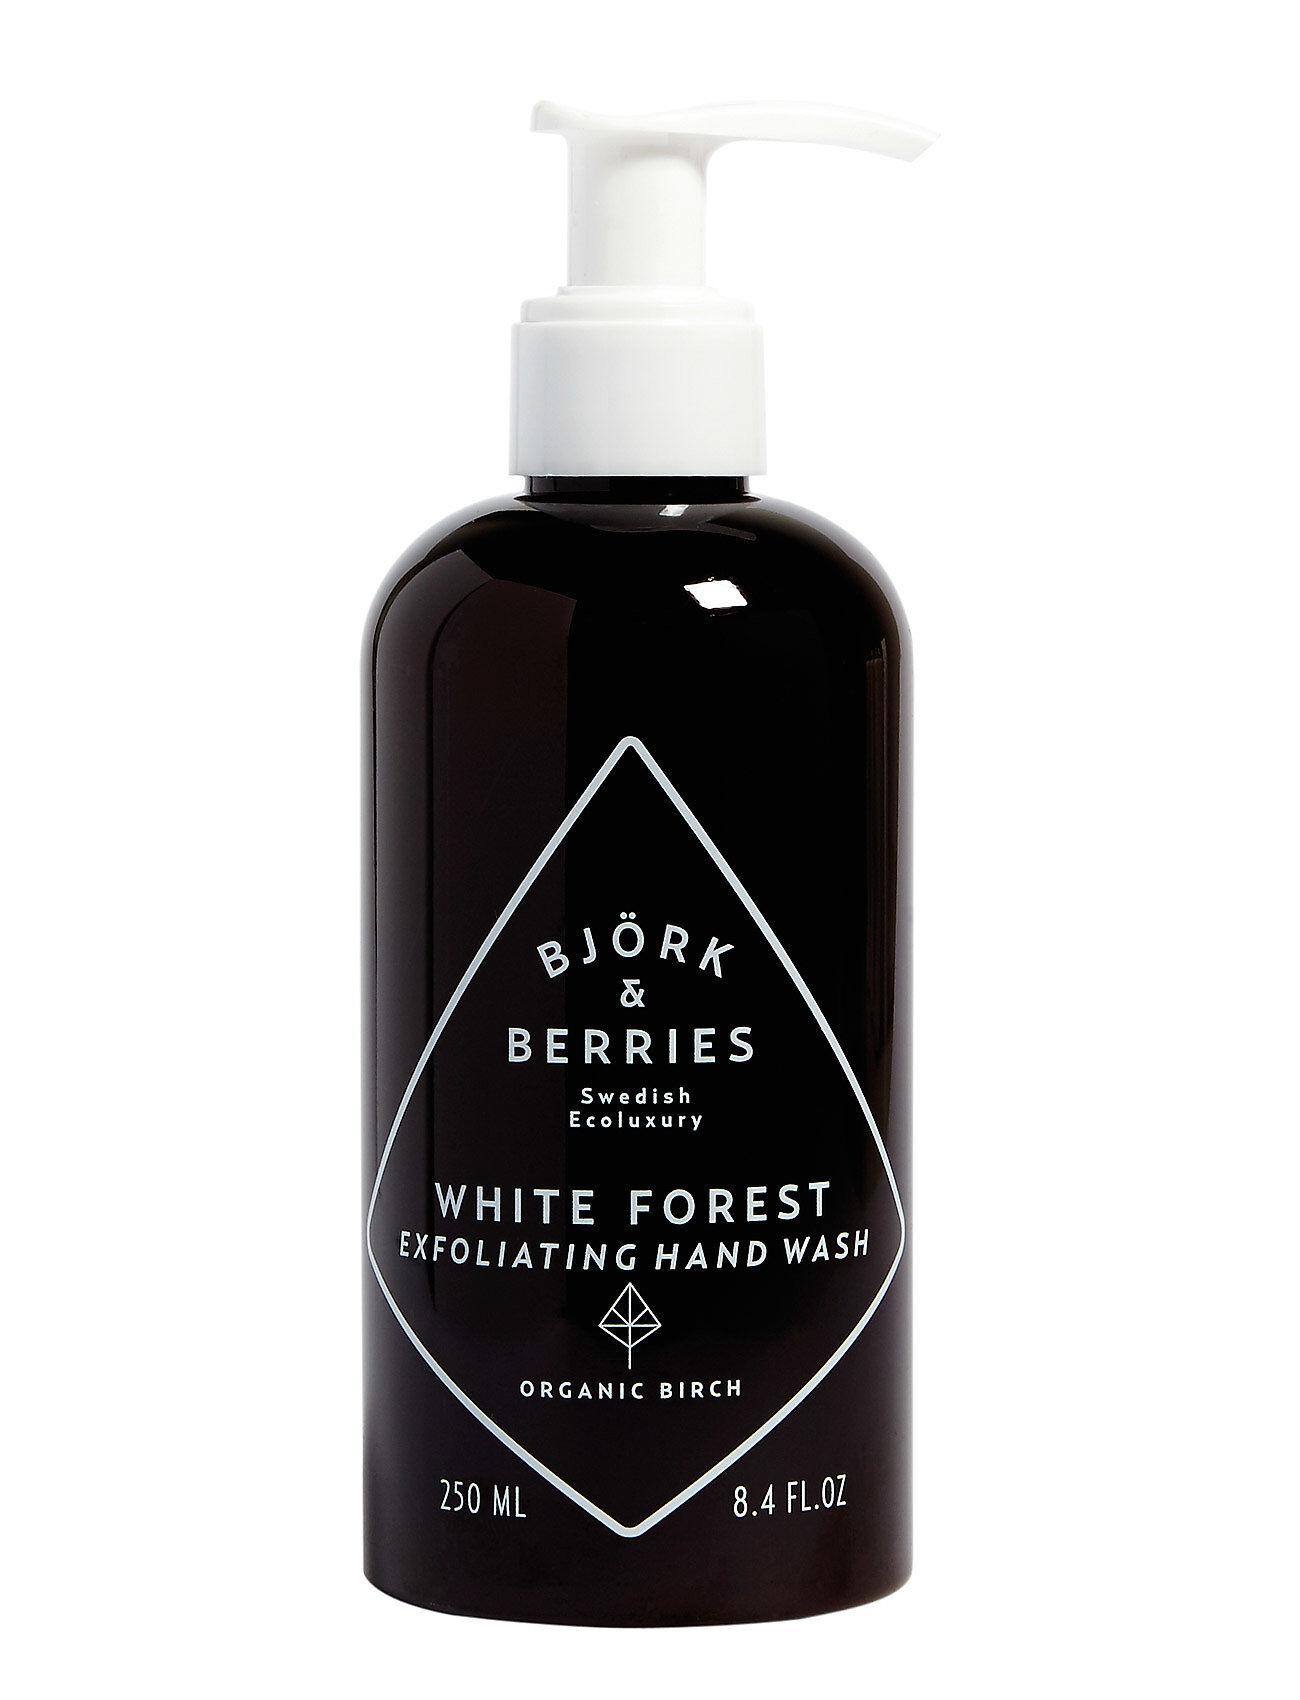 Björk & Berries White Forest Exfoliating Hand Wash